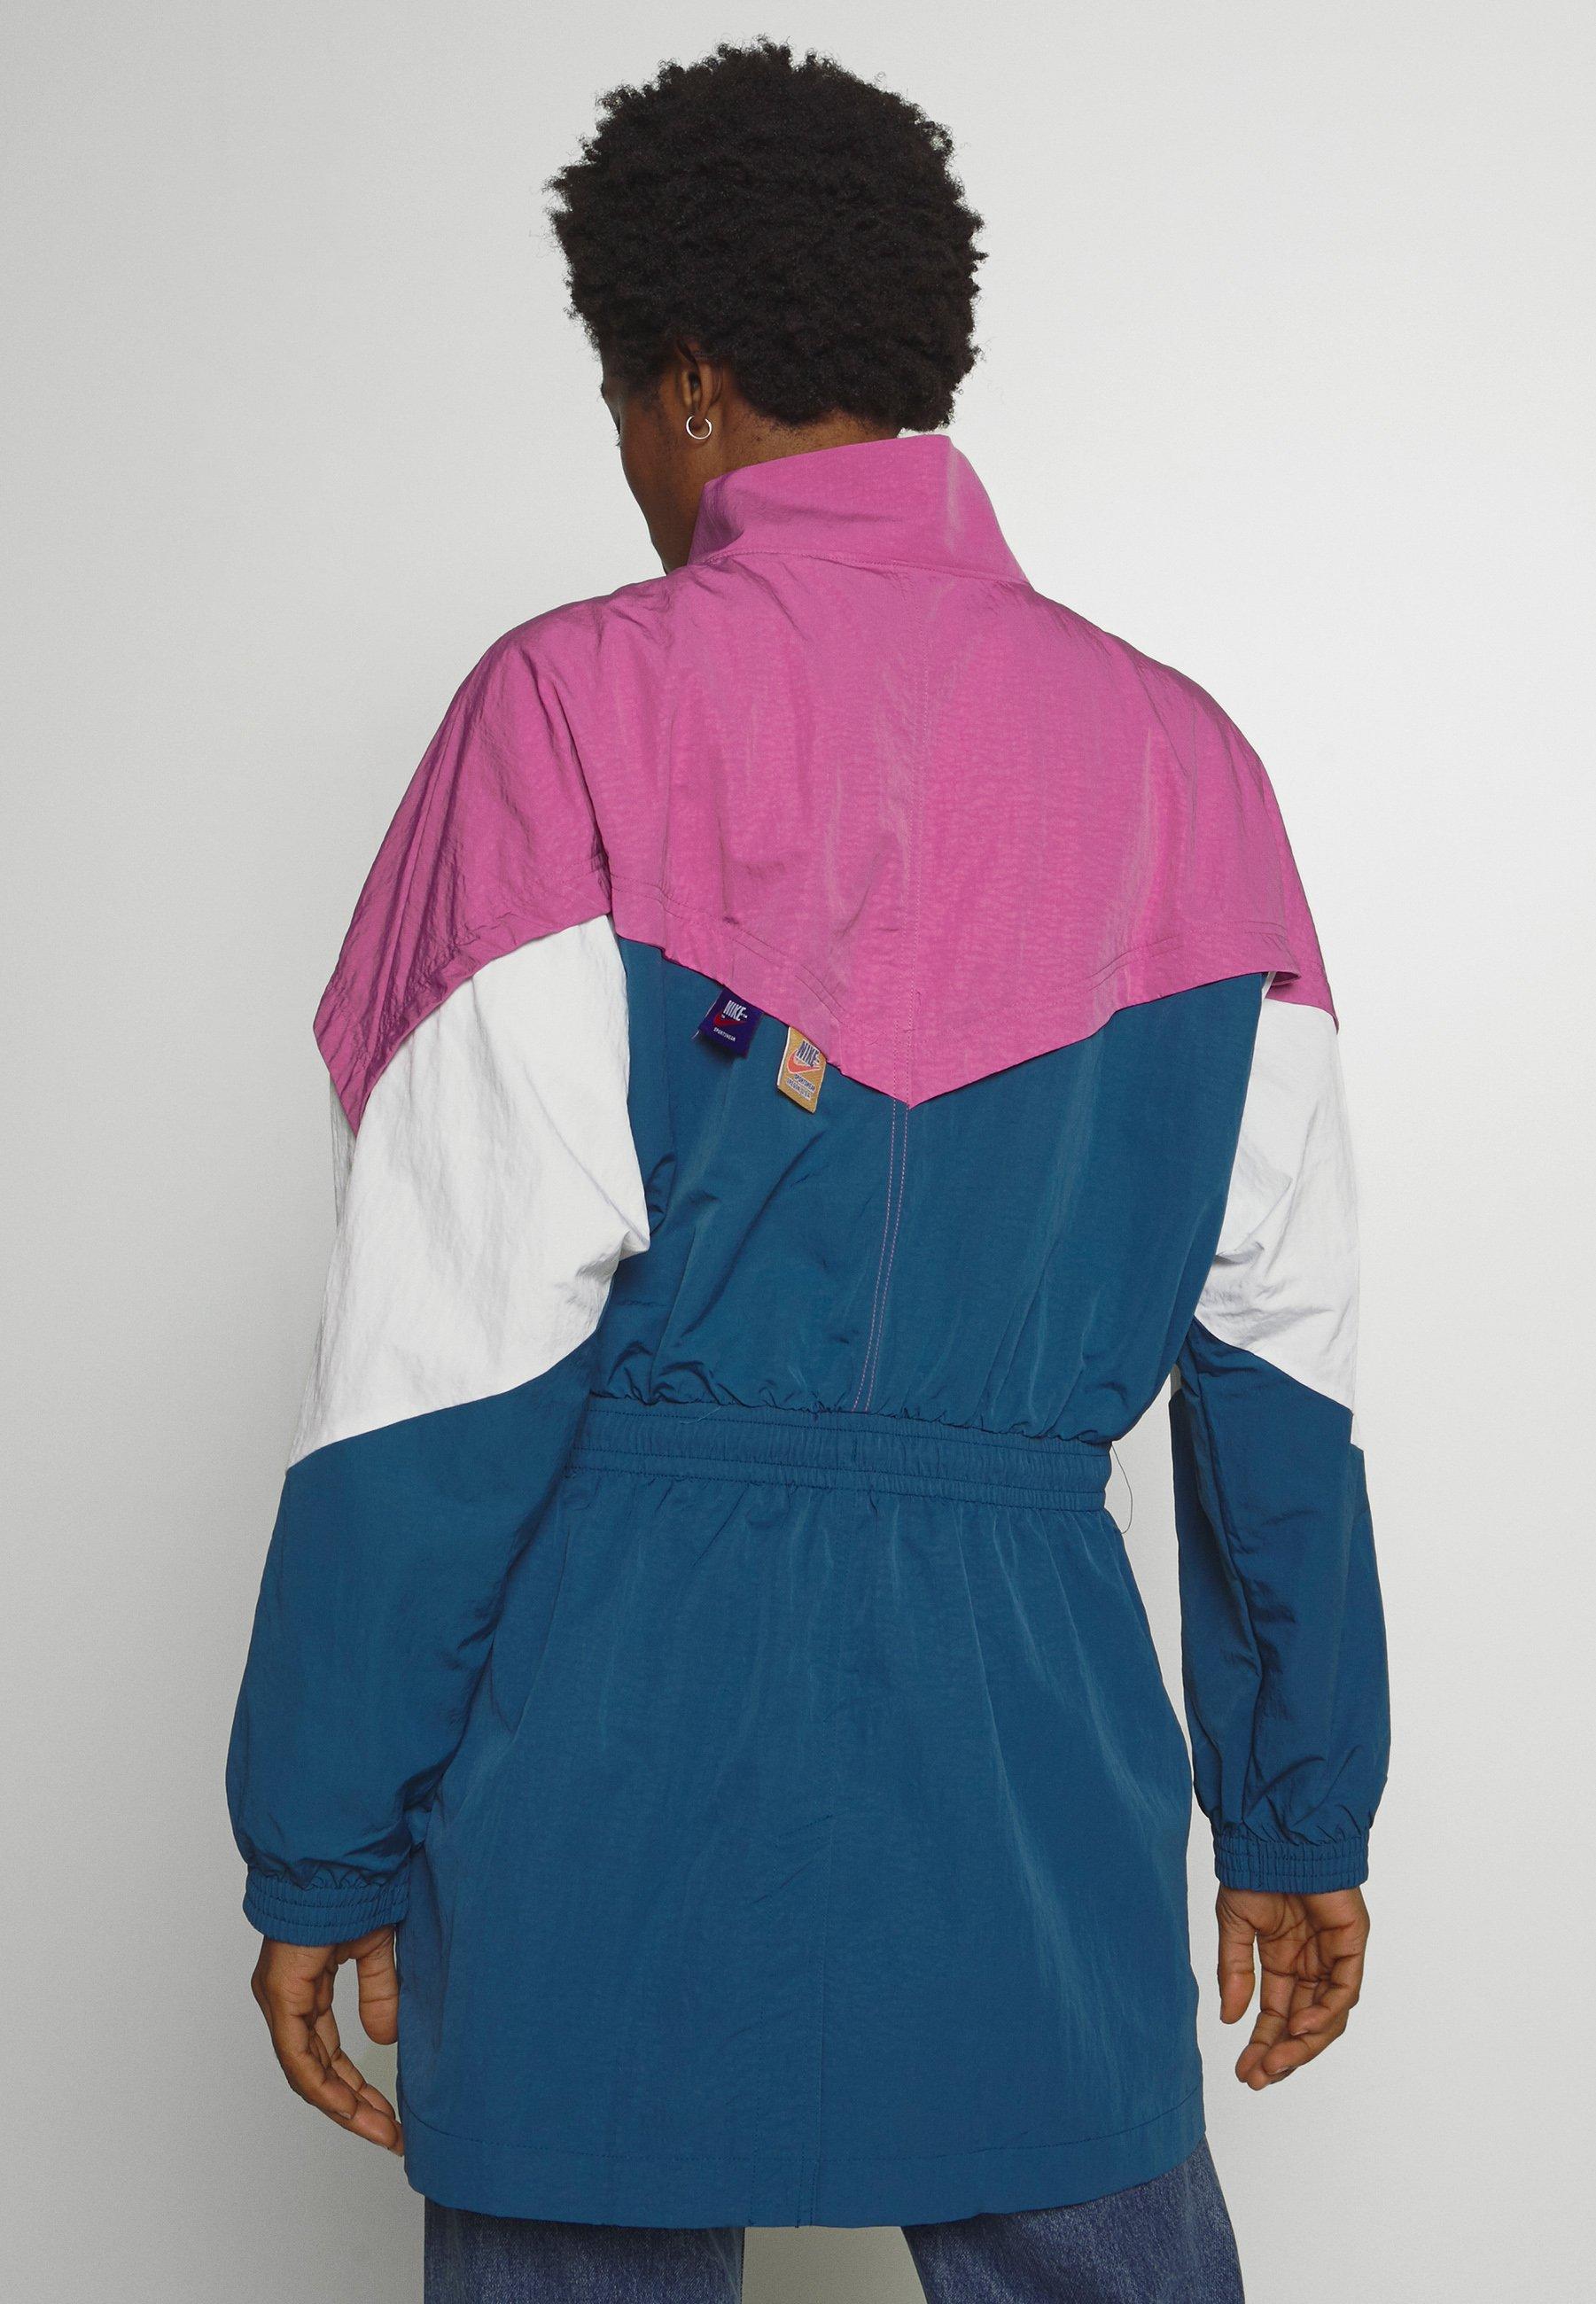 Nike Sportswear TRACK - Parka - cosmic fuchsia - Manteaux Femme eDqEM